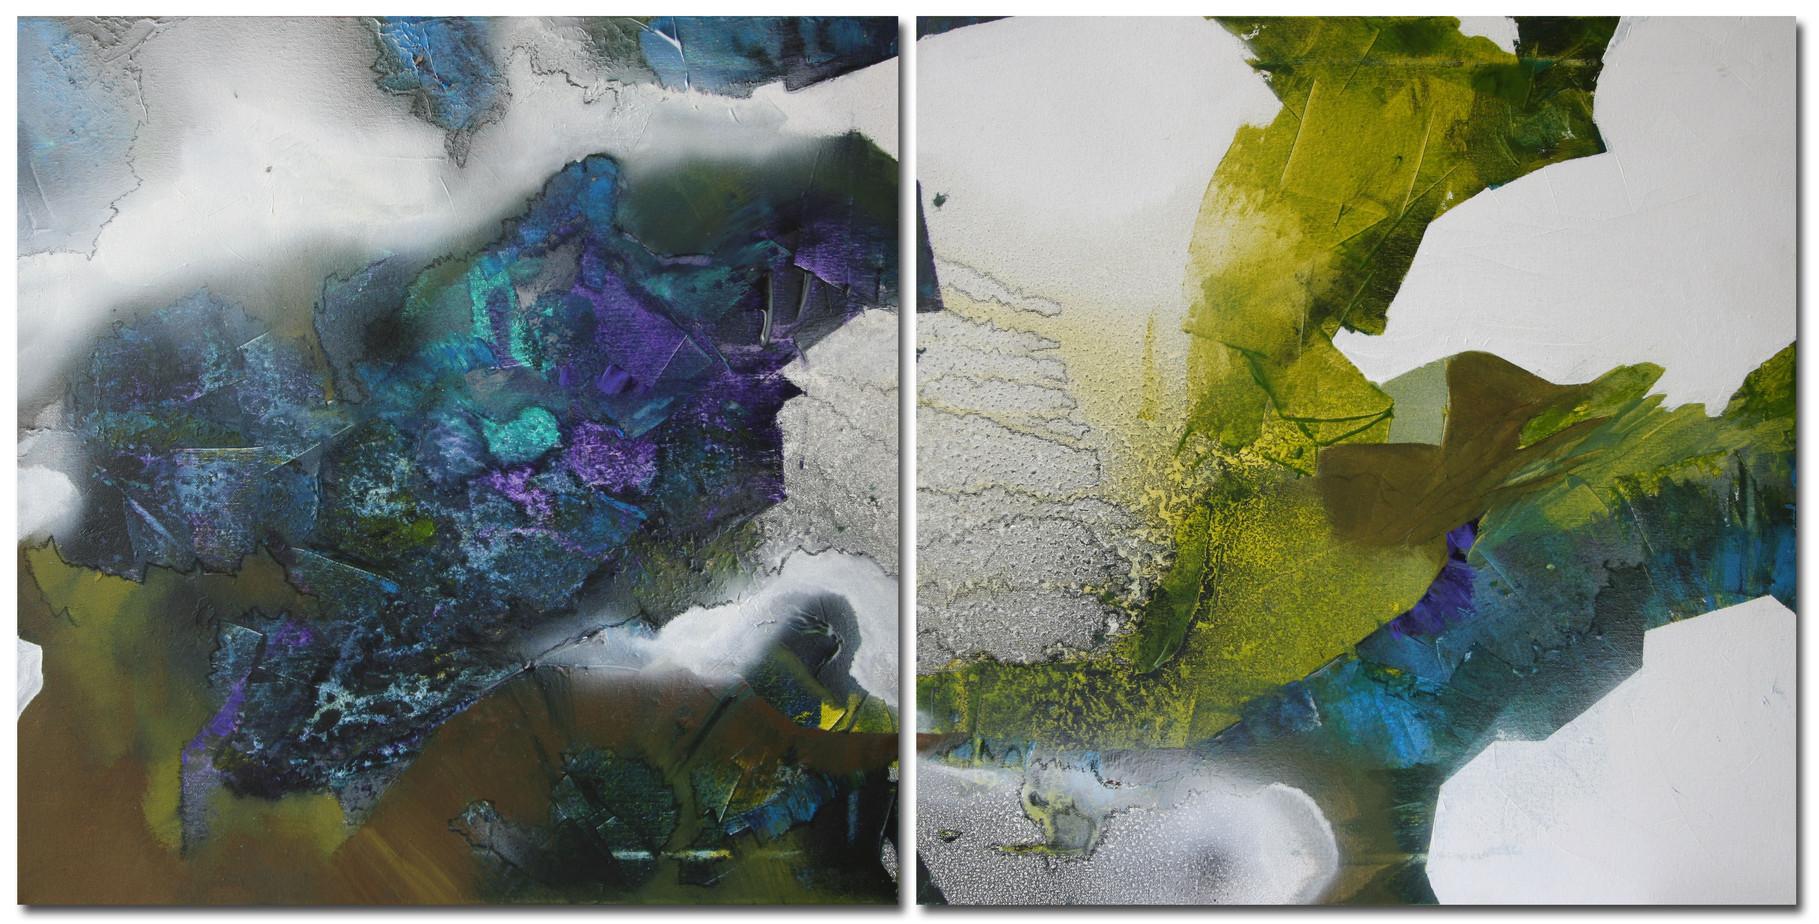 Bild-Collage 1, Acryl auf Leinwand, Gesamtmaß 100 x 50 cm